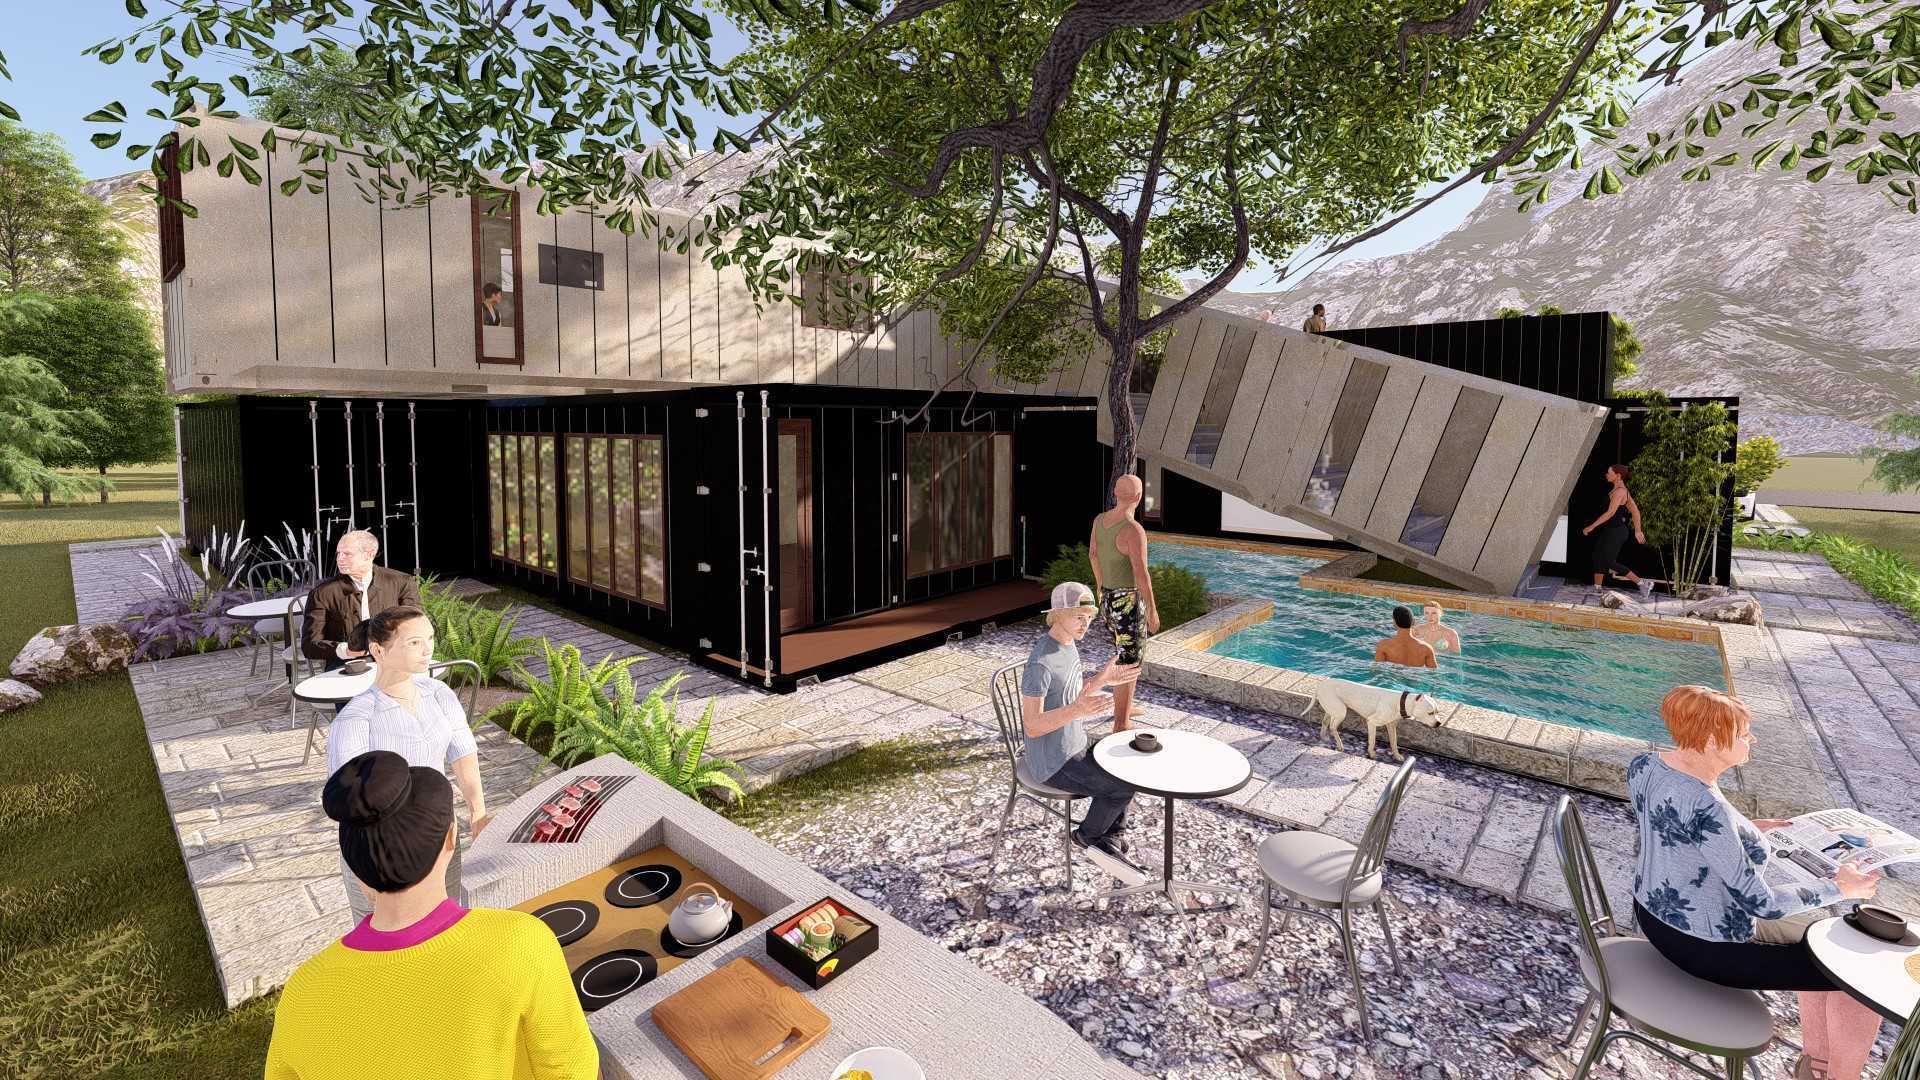 Rasi.o Arsitektur Studio Box2Box Container Villa Indonesia Indonesia Rasio-Arsitektur-Studio-Box2Box-Container-Villa  127552